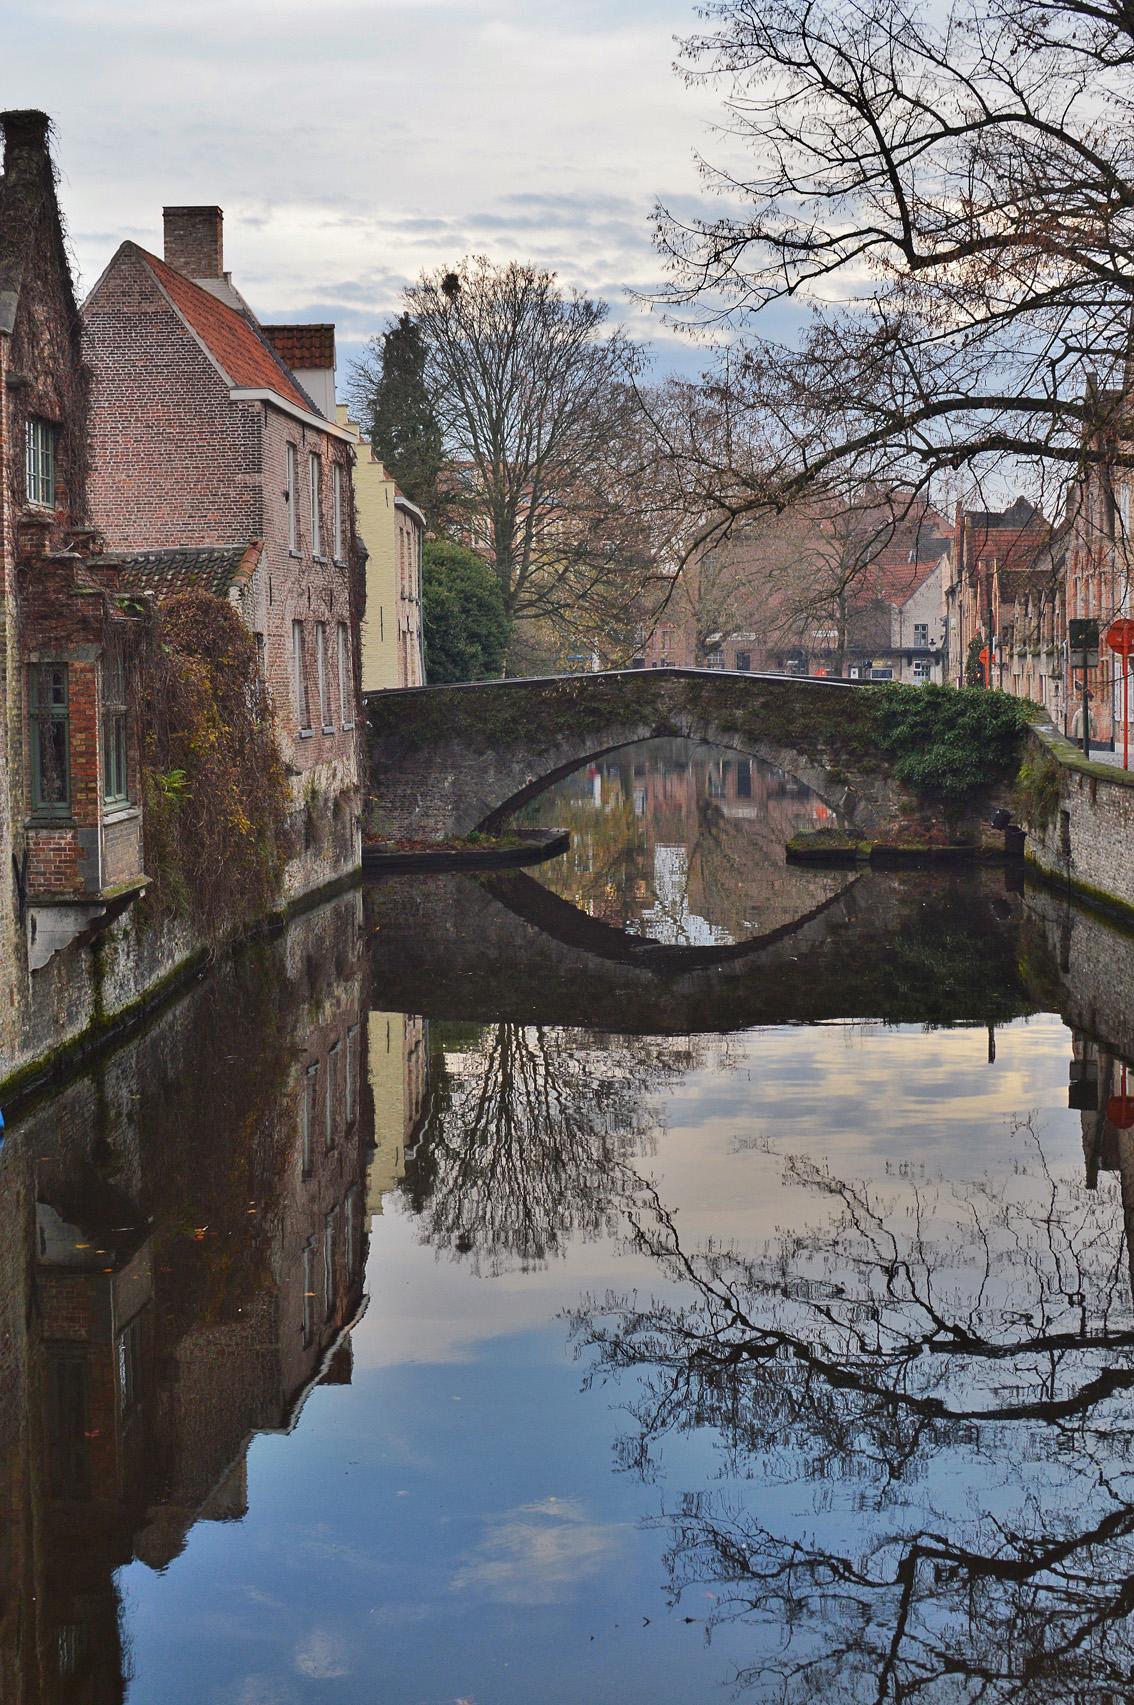 56-1 Un weekend in Belgio. Alla scoperta delle Fiandre: Bruges .